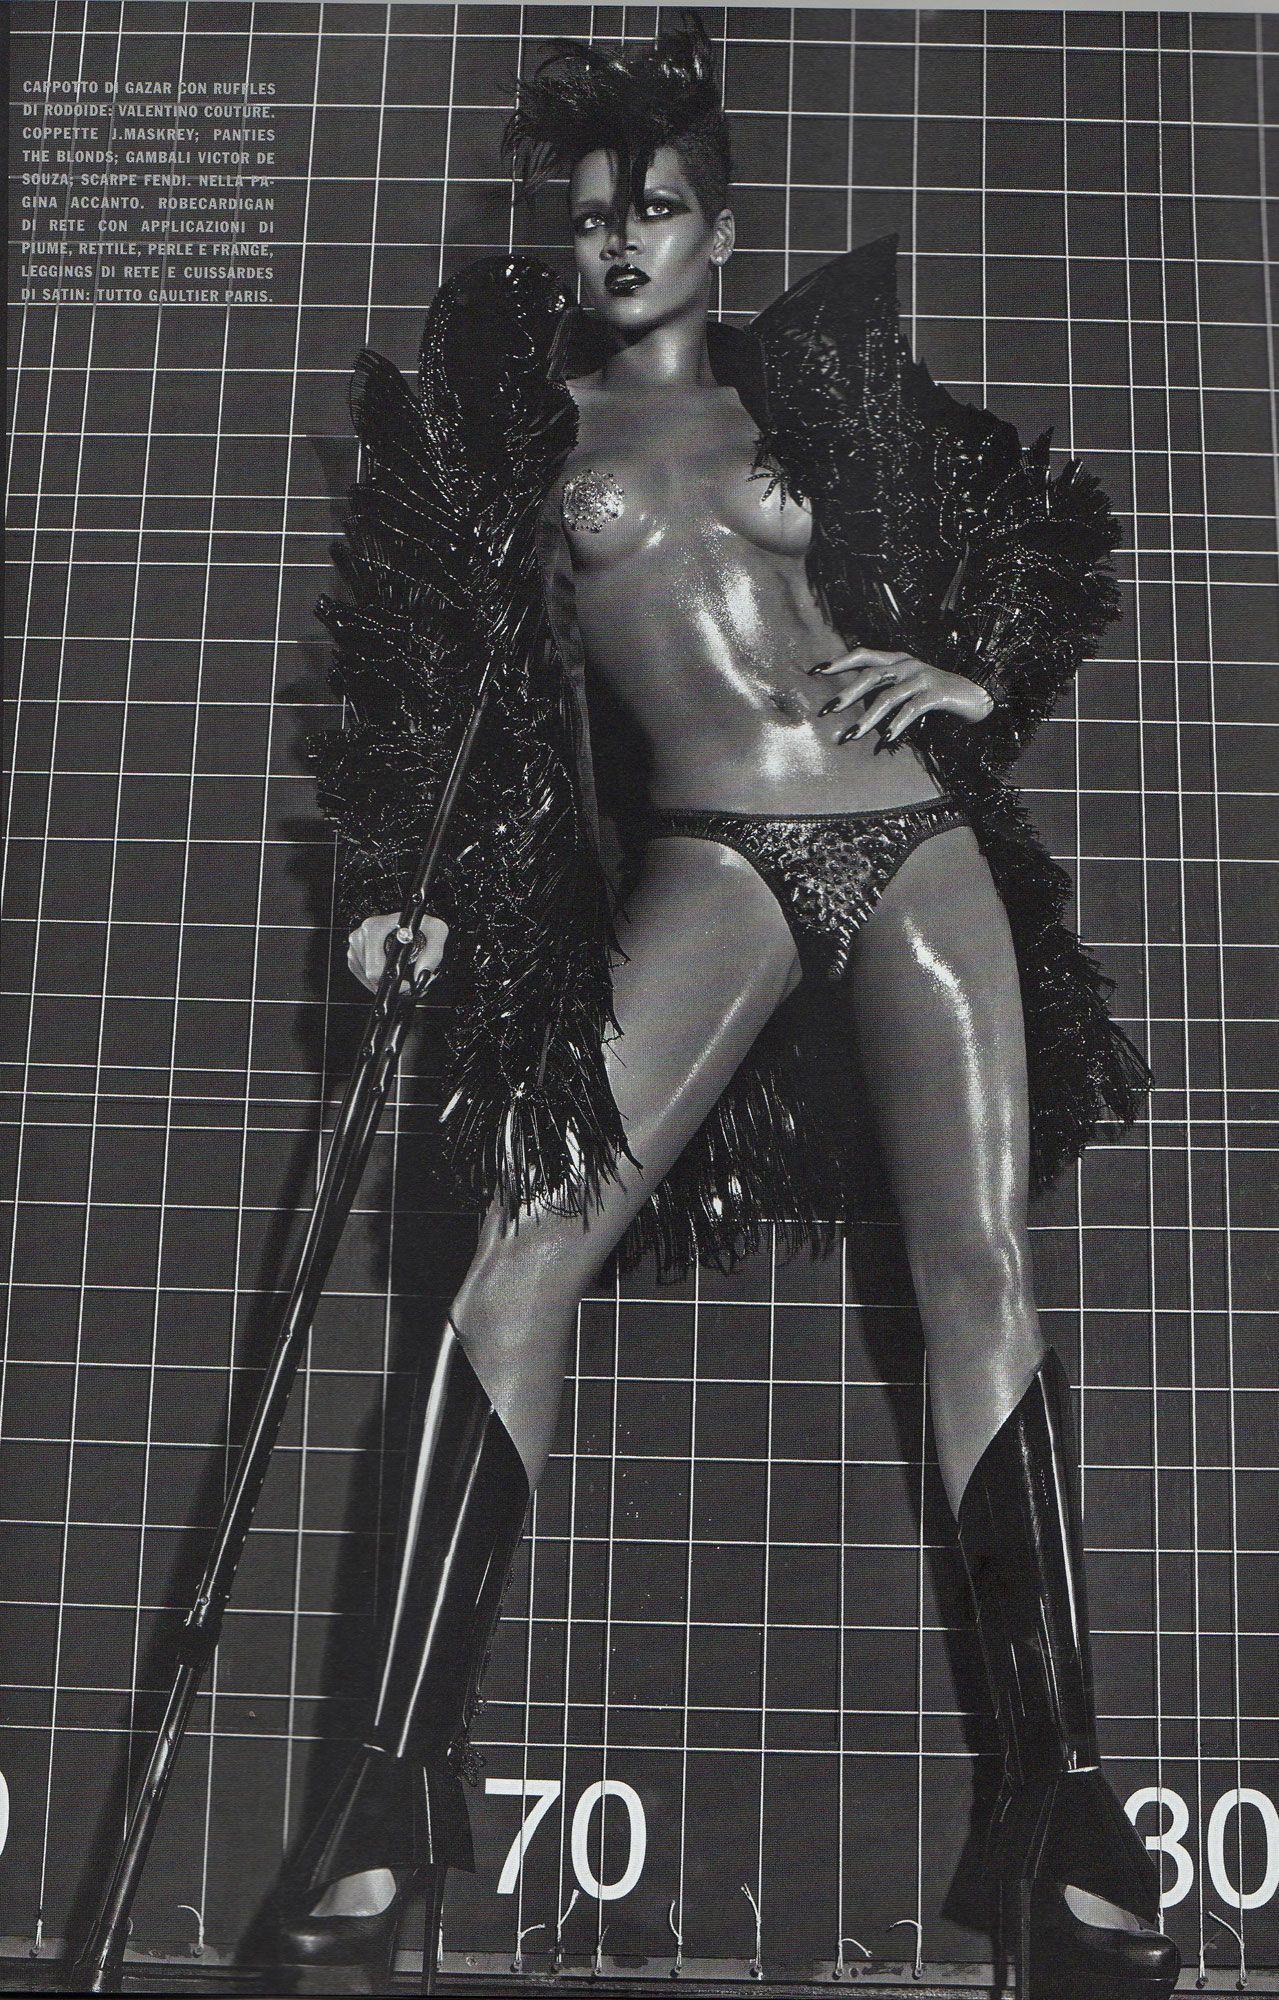 Rihanna Nude Topless Photoshoot Photos Leaked 1